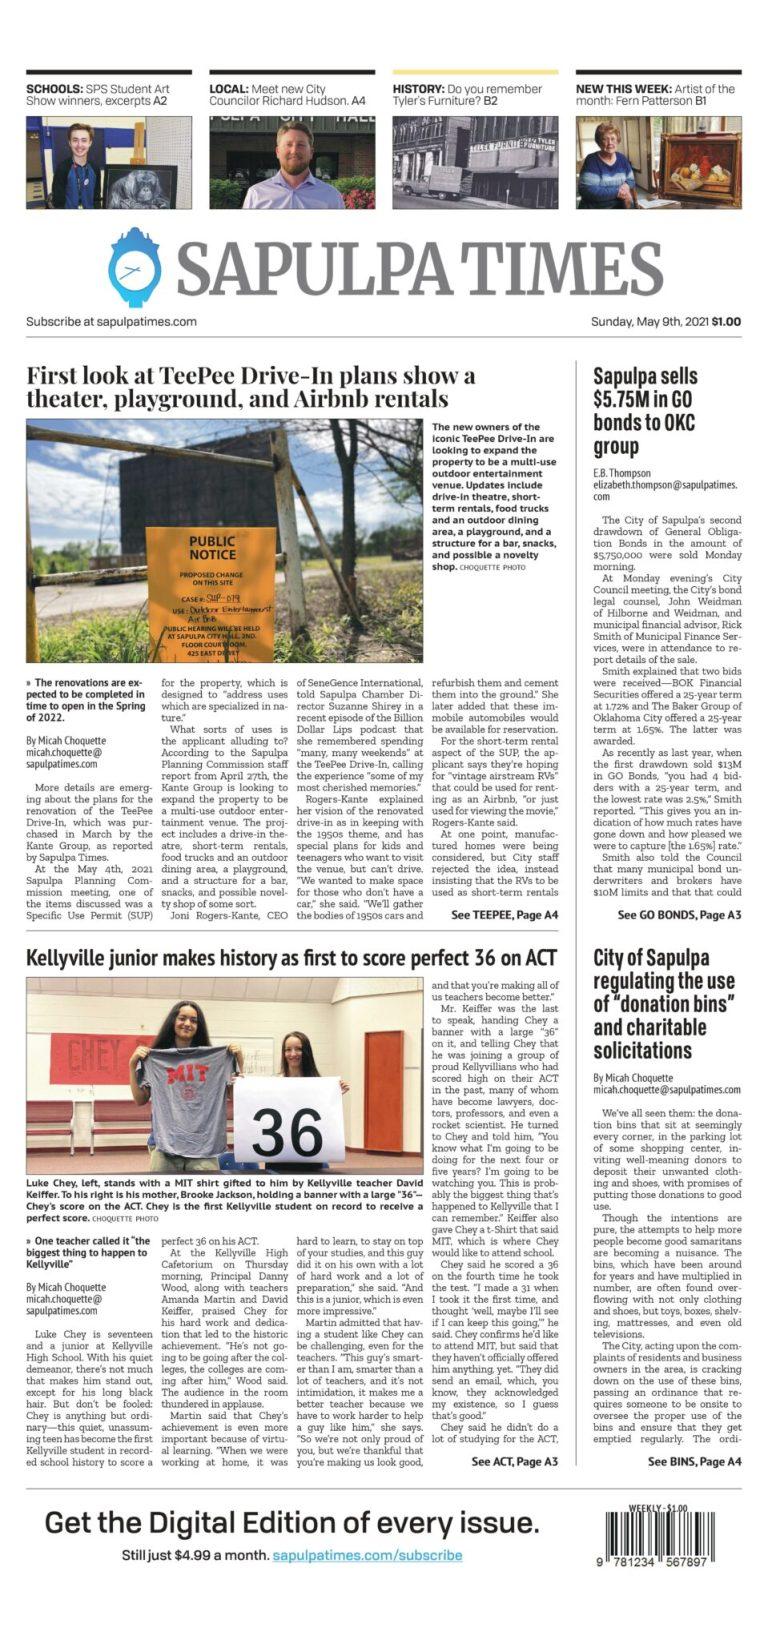 Sapulpa Times Digital Edition 05/09/2021